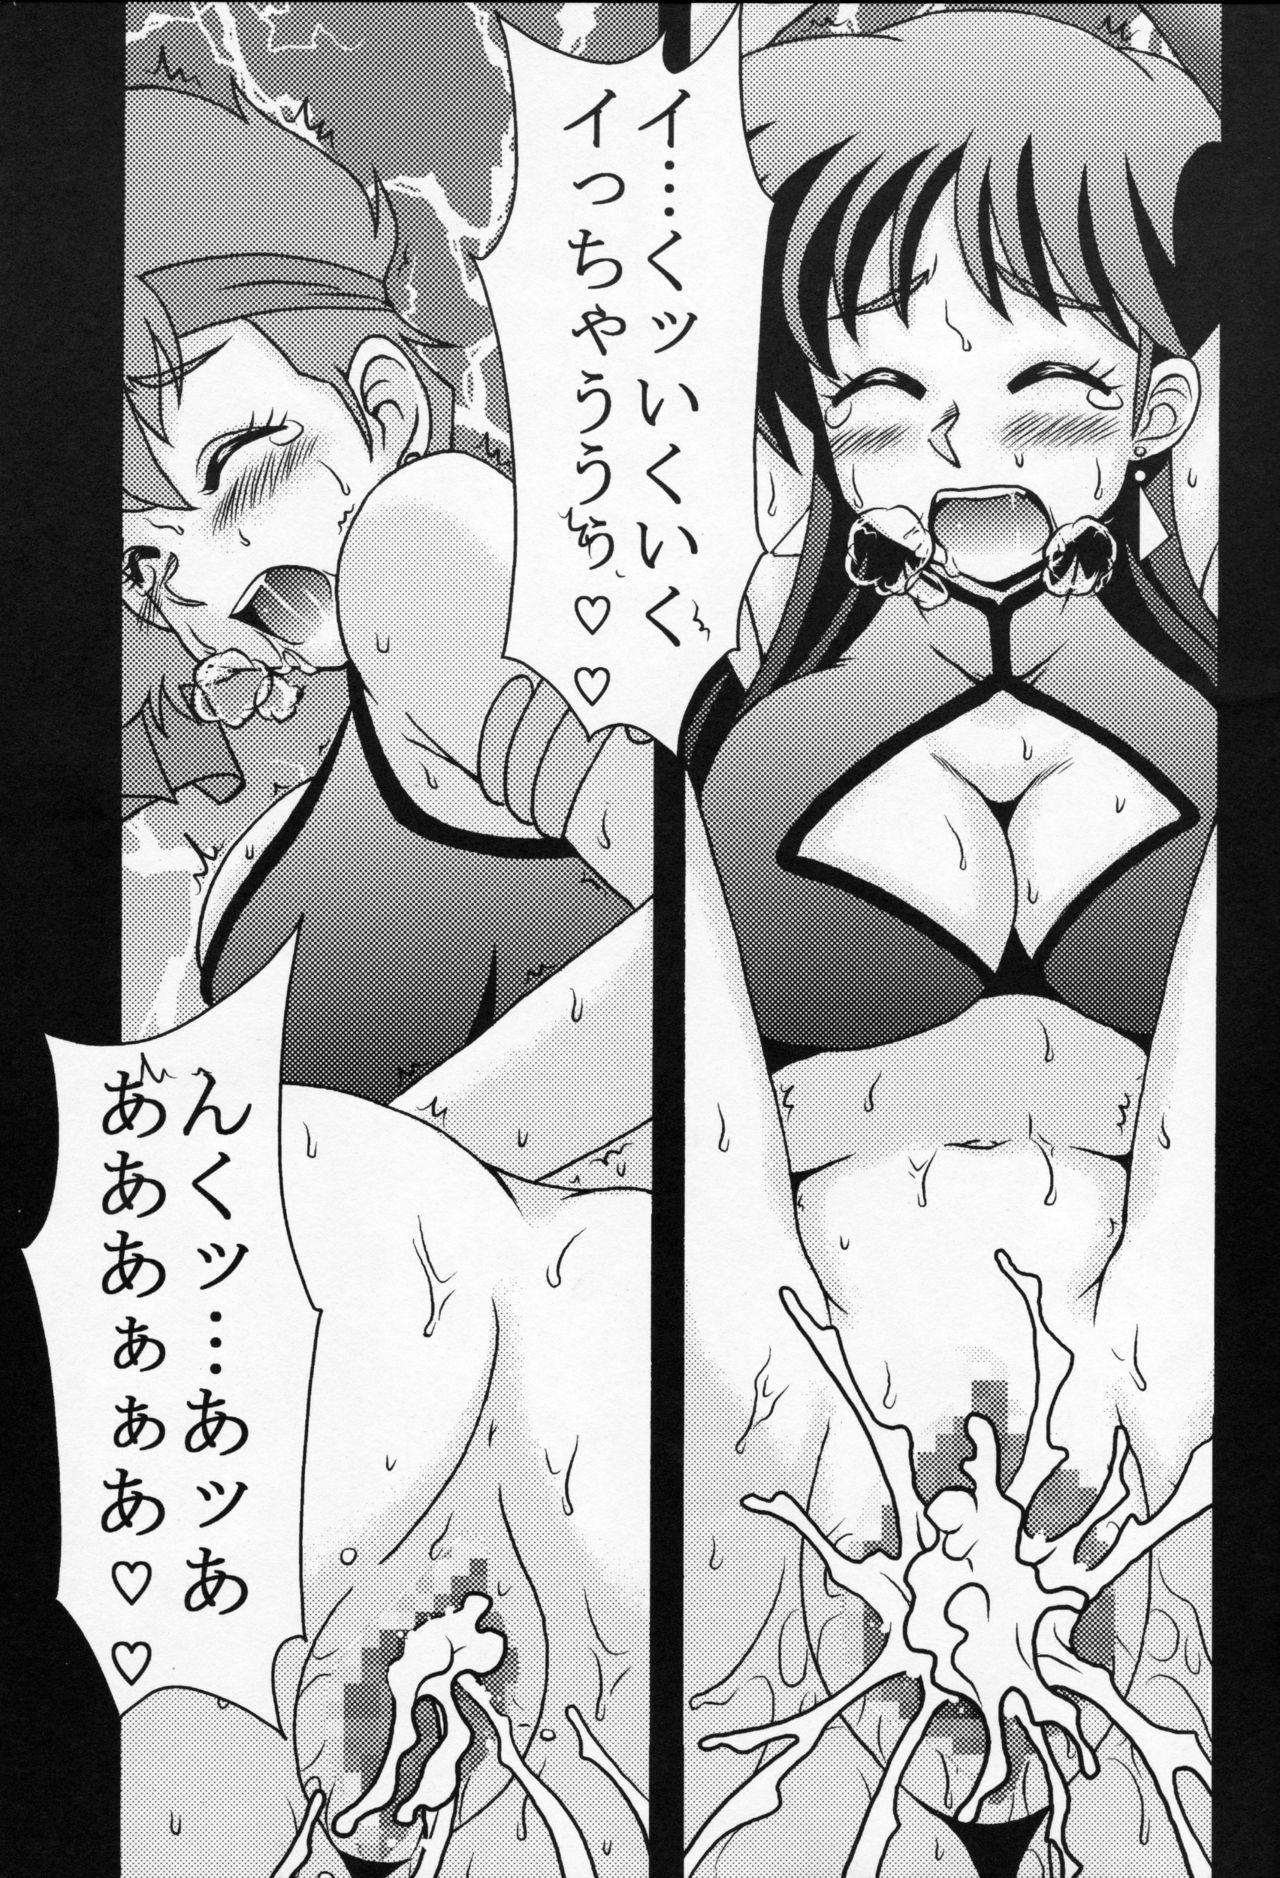 Kei to Yuri 23